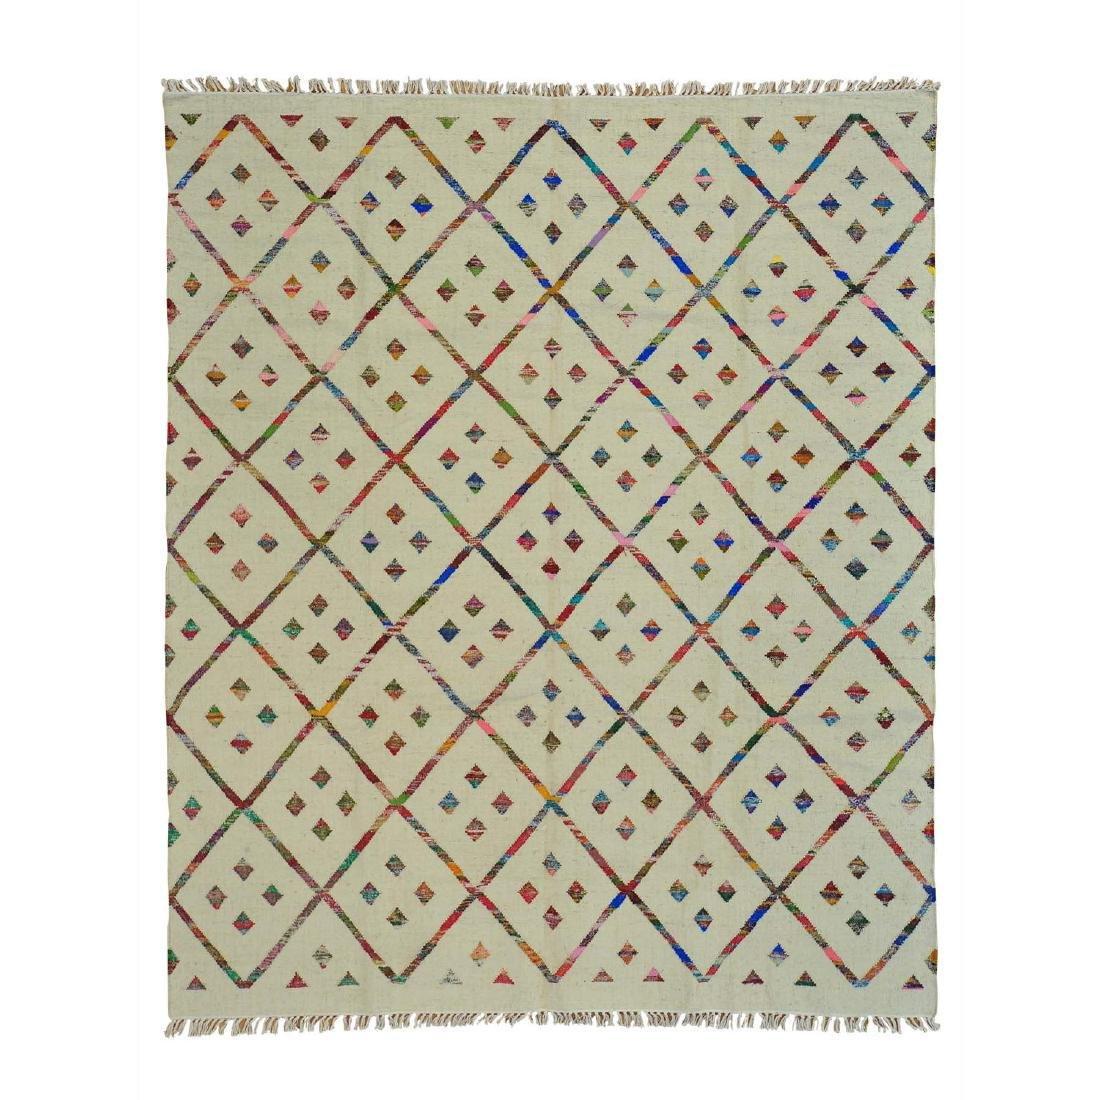 Hand Woven Flat Weave Wool Sari Silk Durie Rug 8.1x9.10